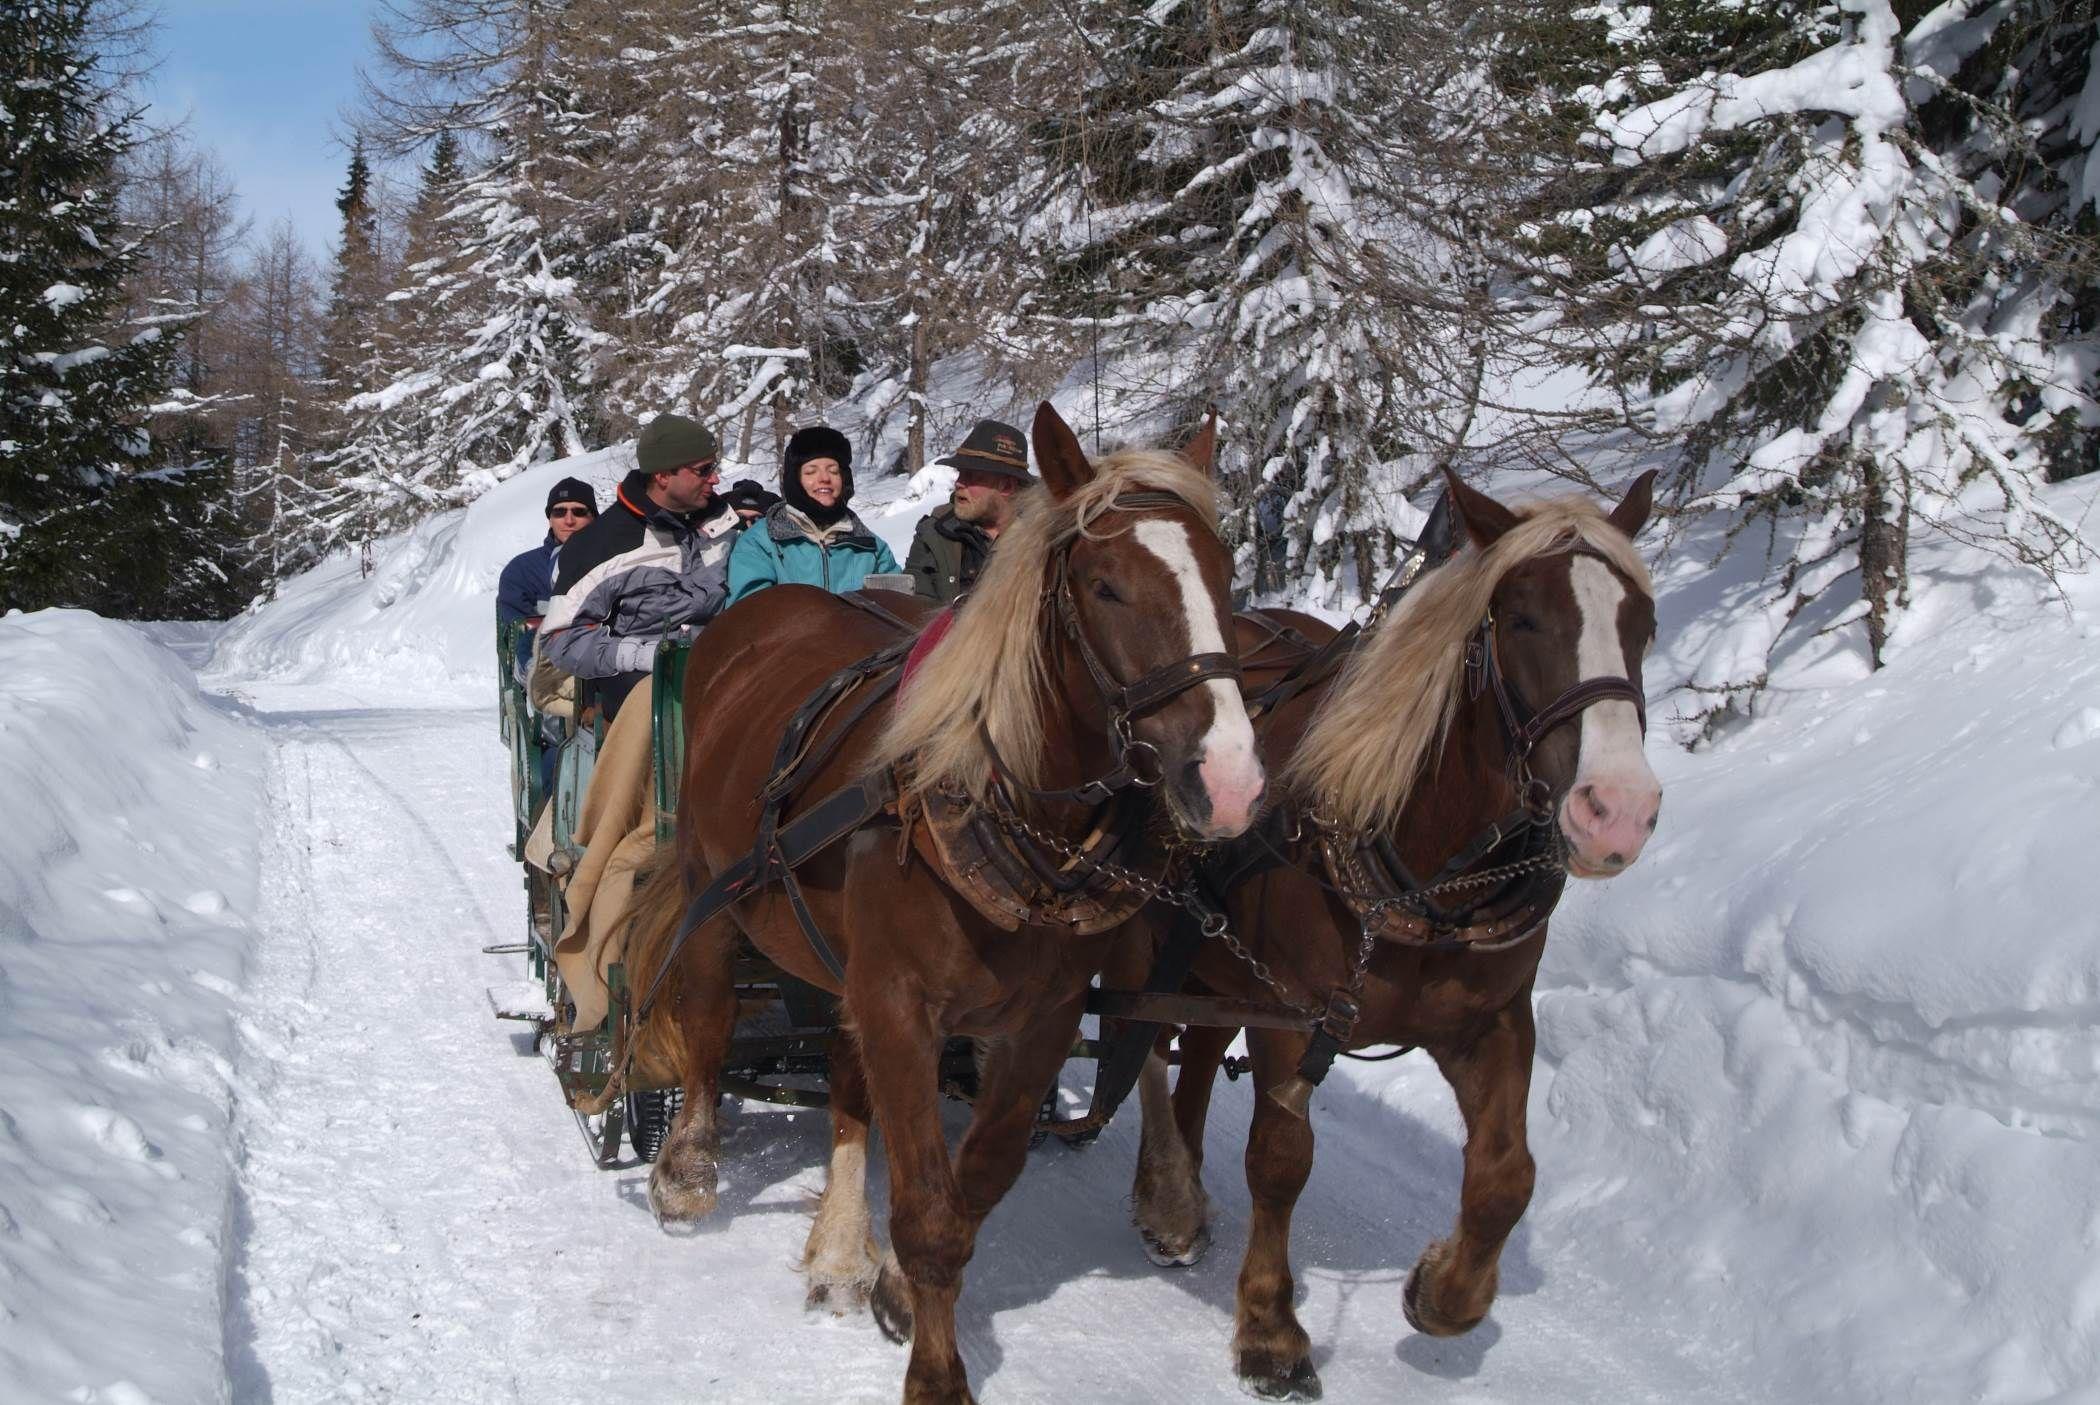 horse-drawn sleigh rides, Badkleinkirchheim, Austria